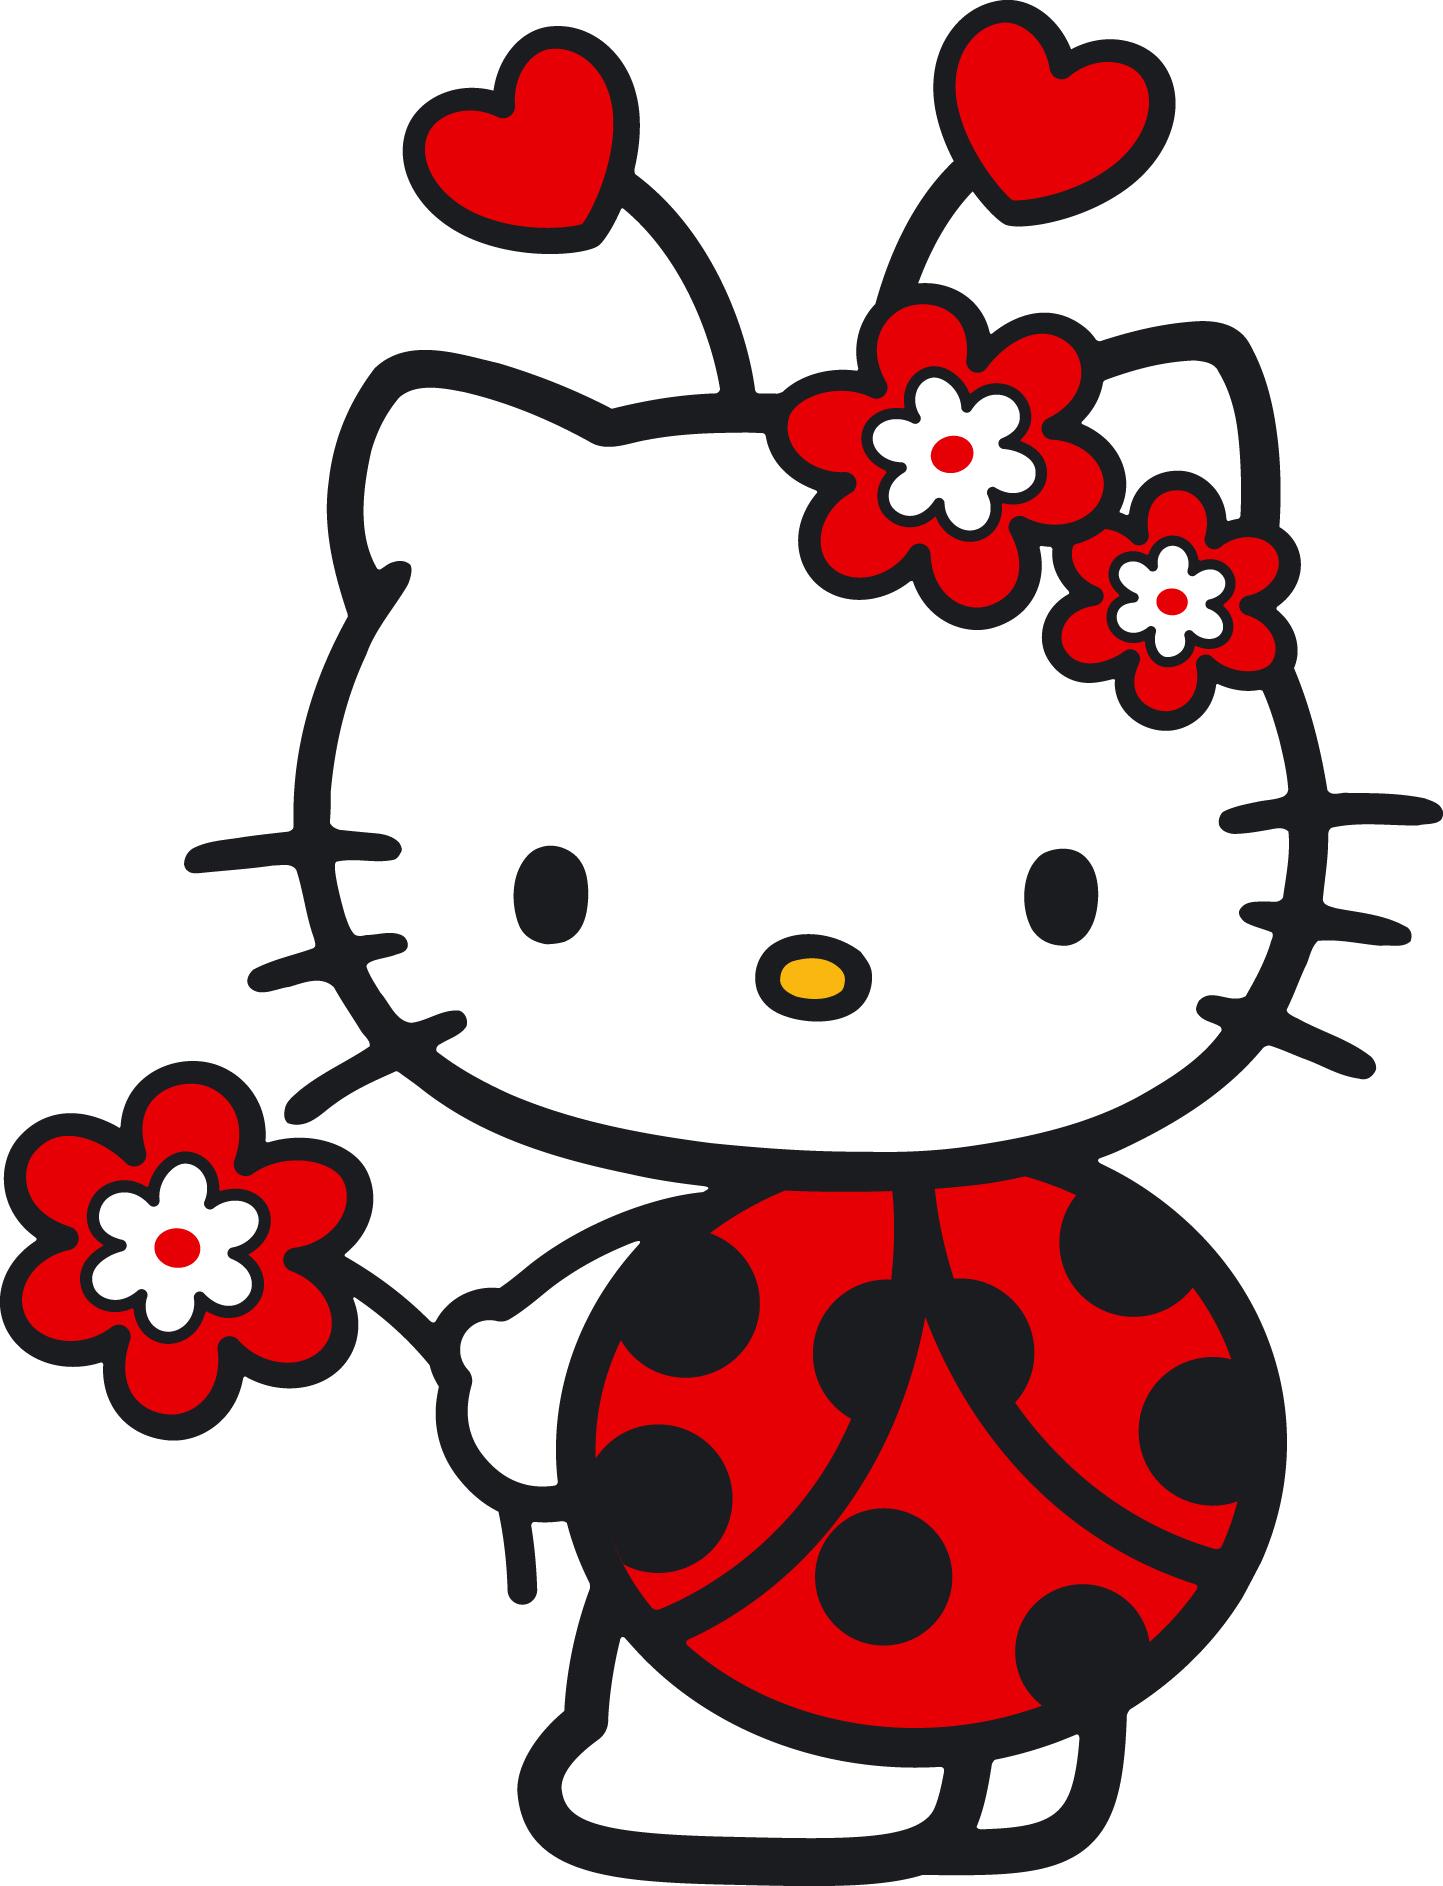 Hello Kitty  GB Pics  Gästebuch Bilder  Hello Kitty   -> Kuchnia Dziecieca Hello Kitty